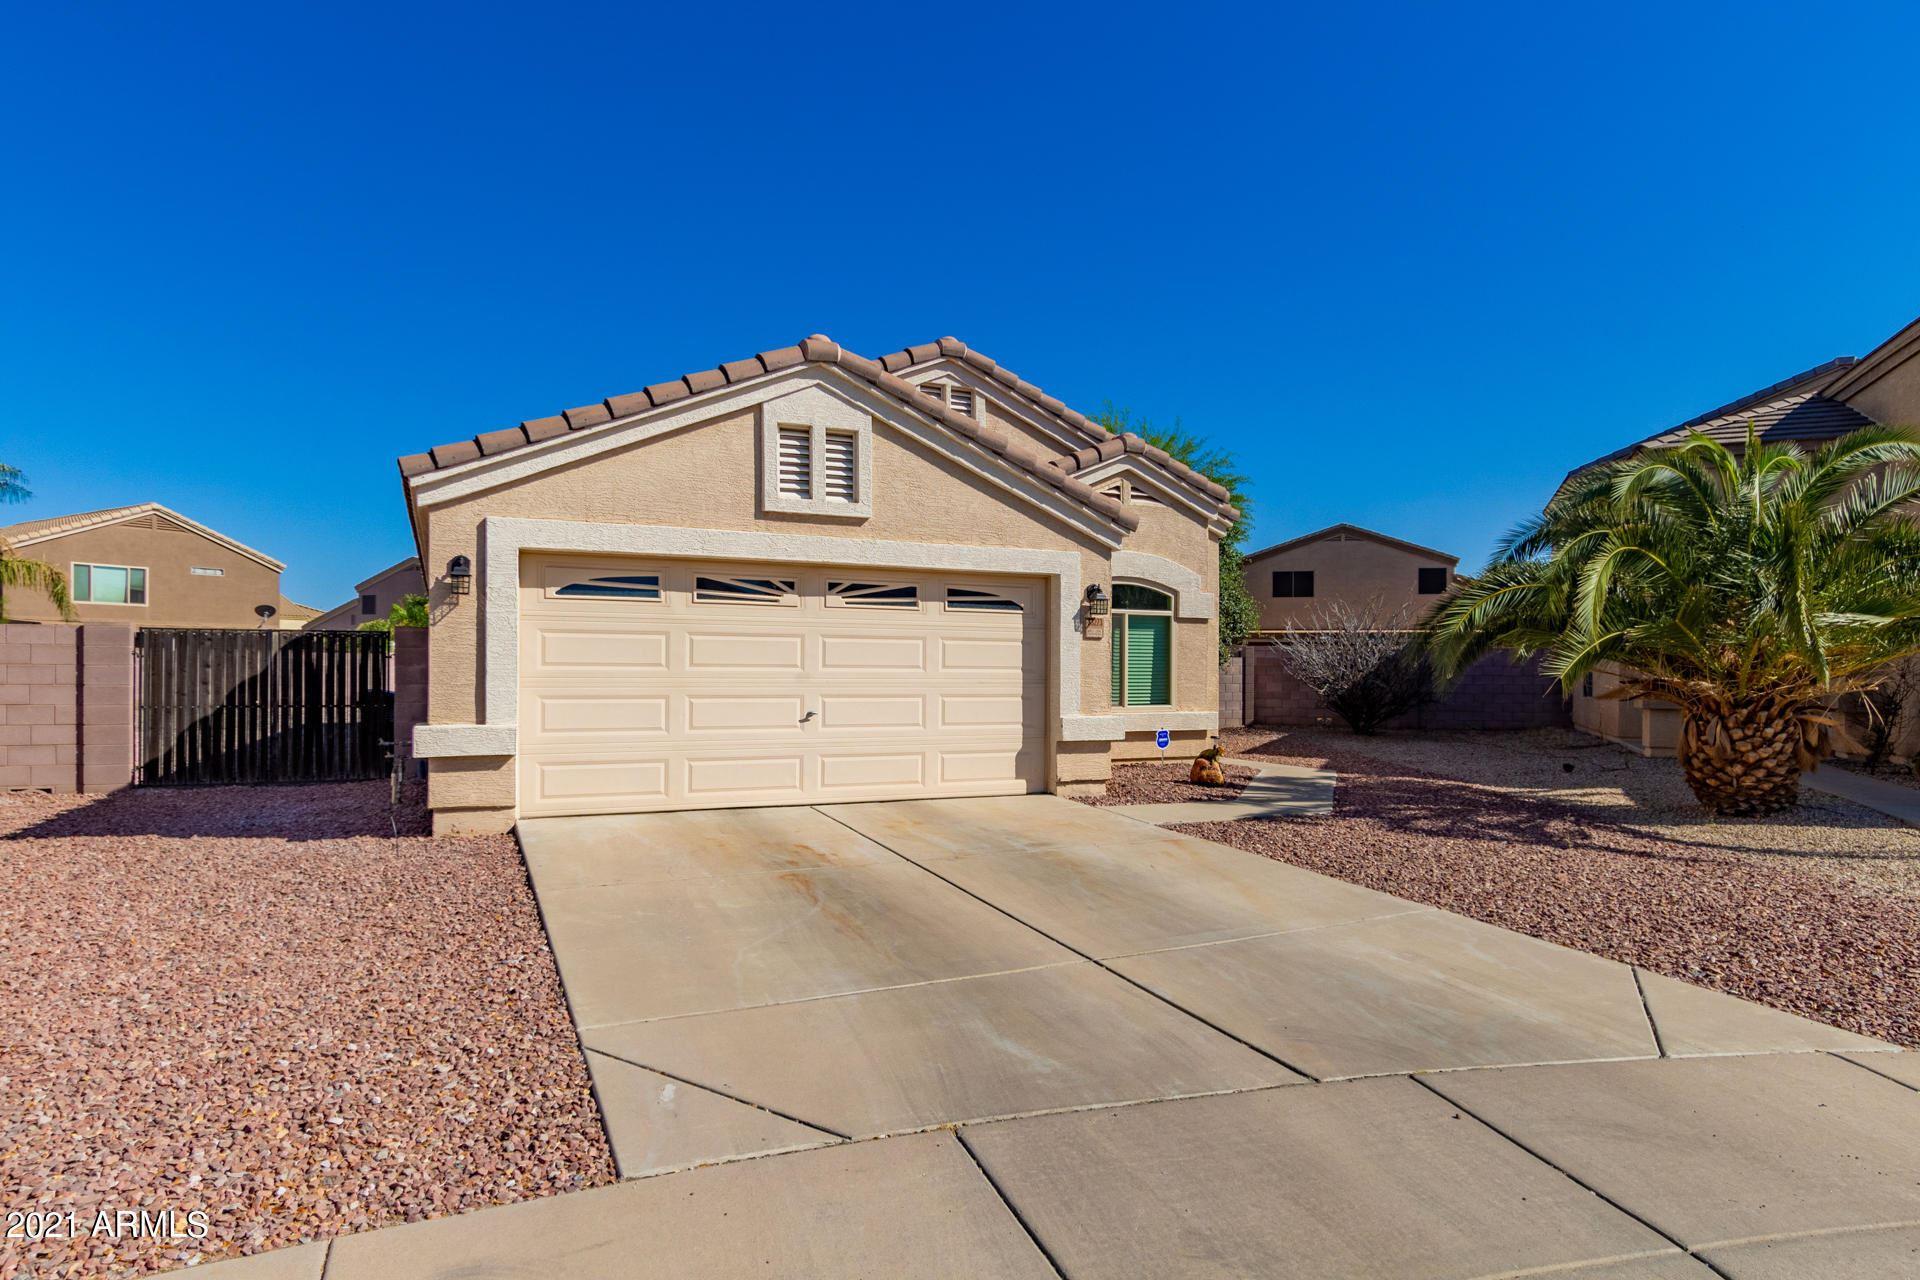 Photo of 33273 N WINDMILL Run, Queen Creek, AZ 85142 (MLS # 6248539)